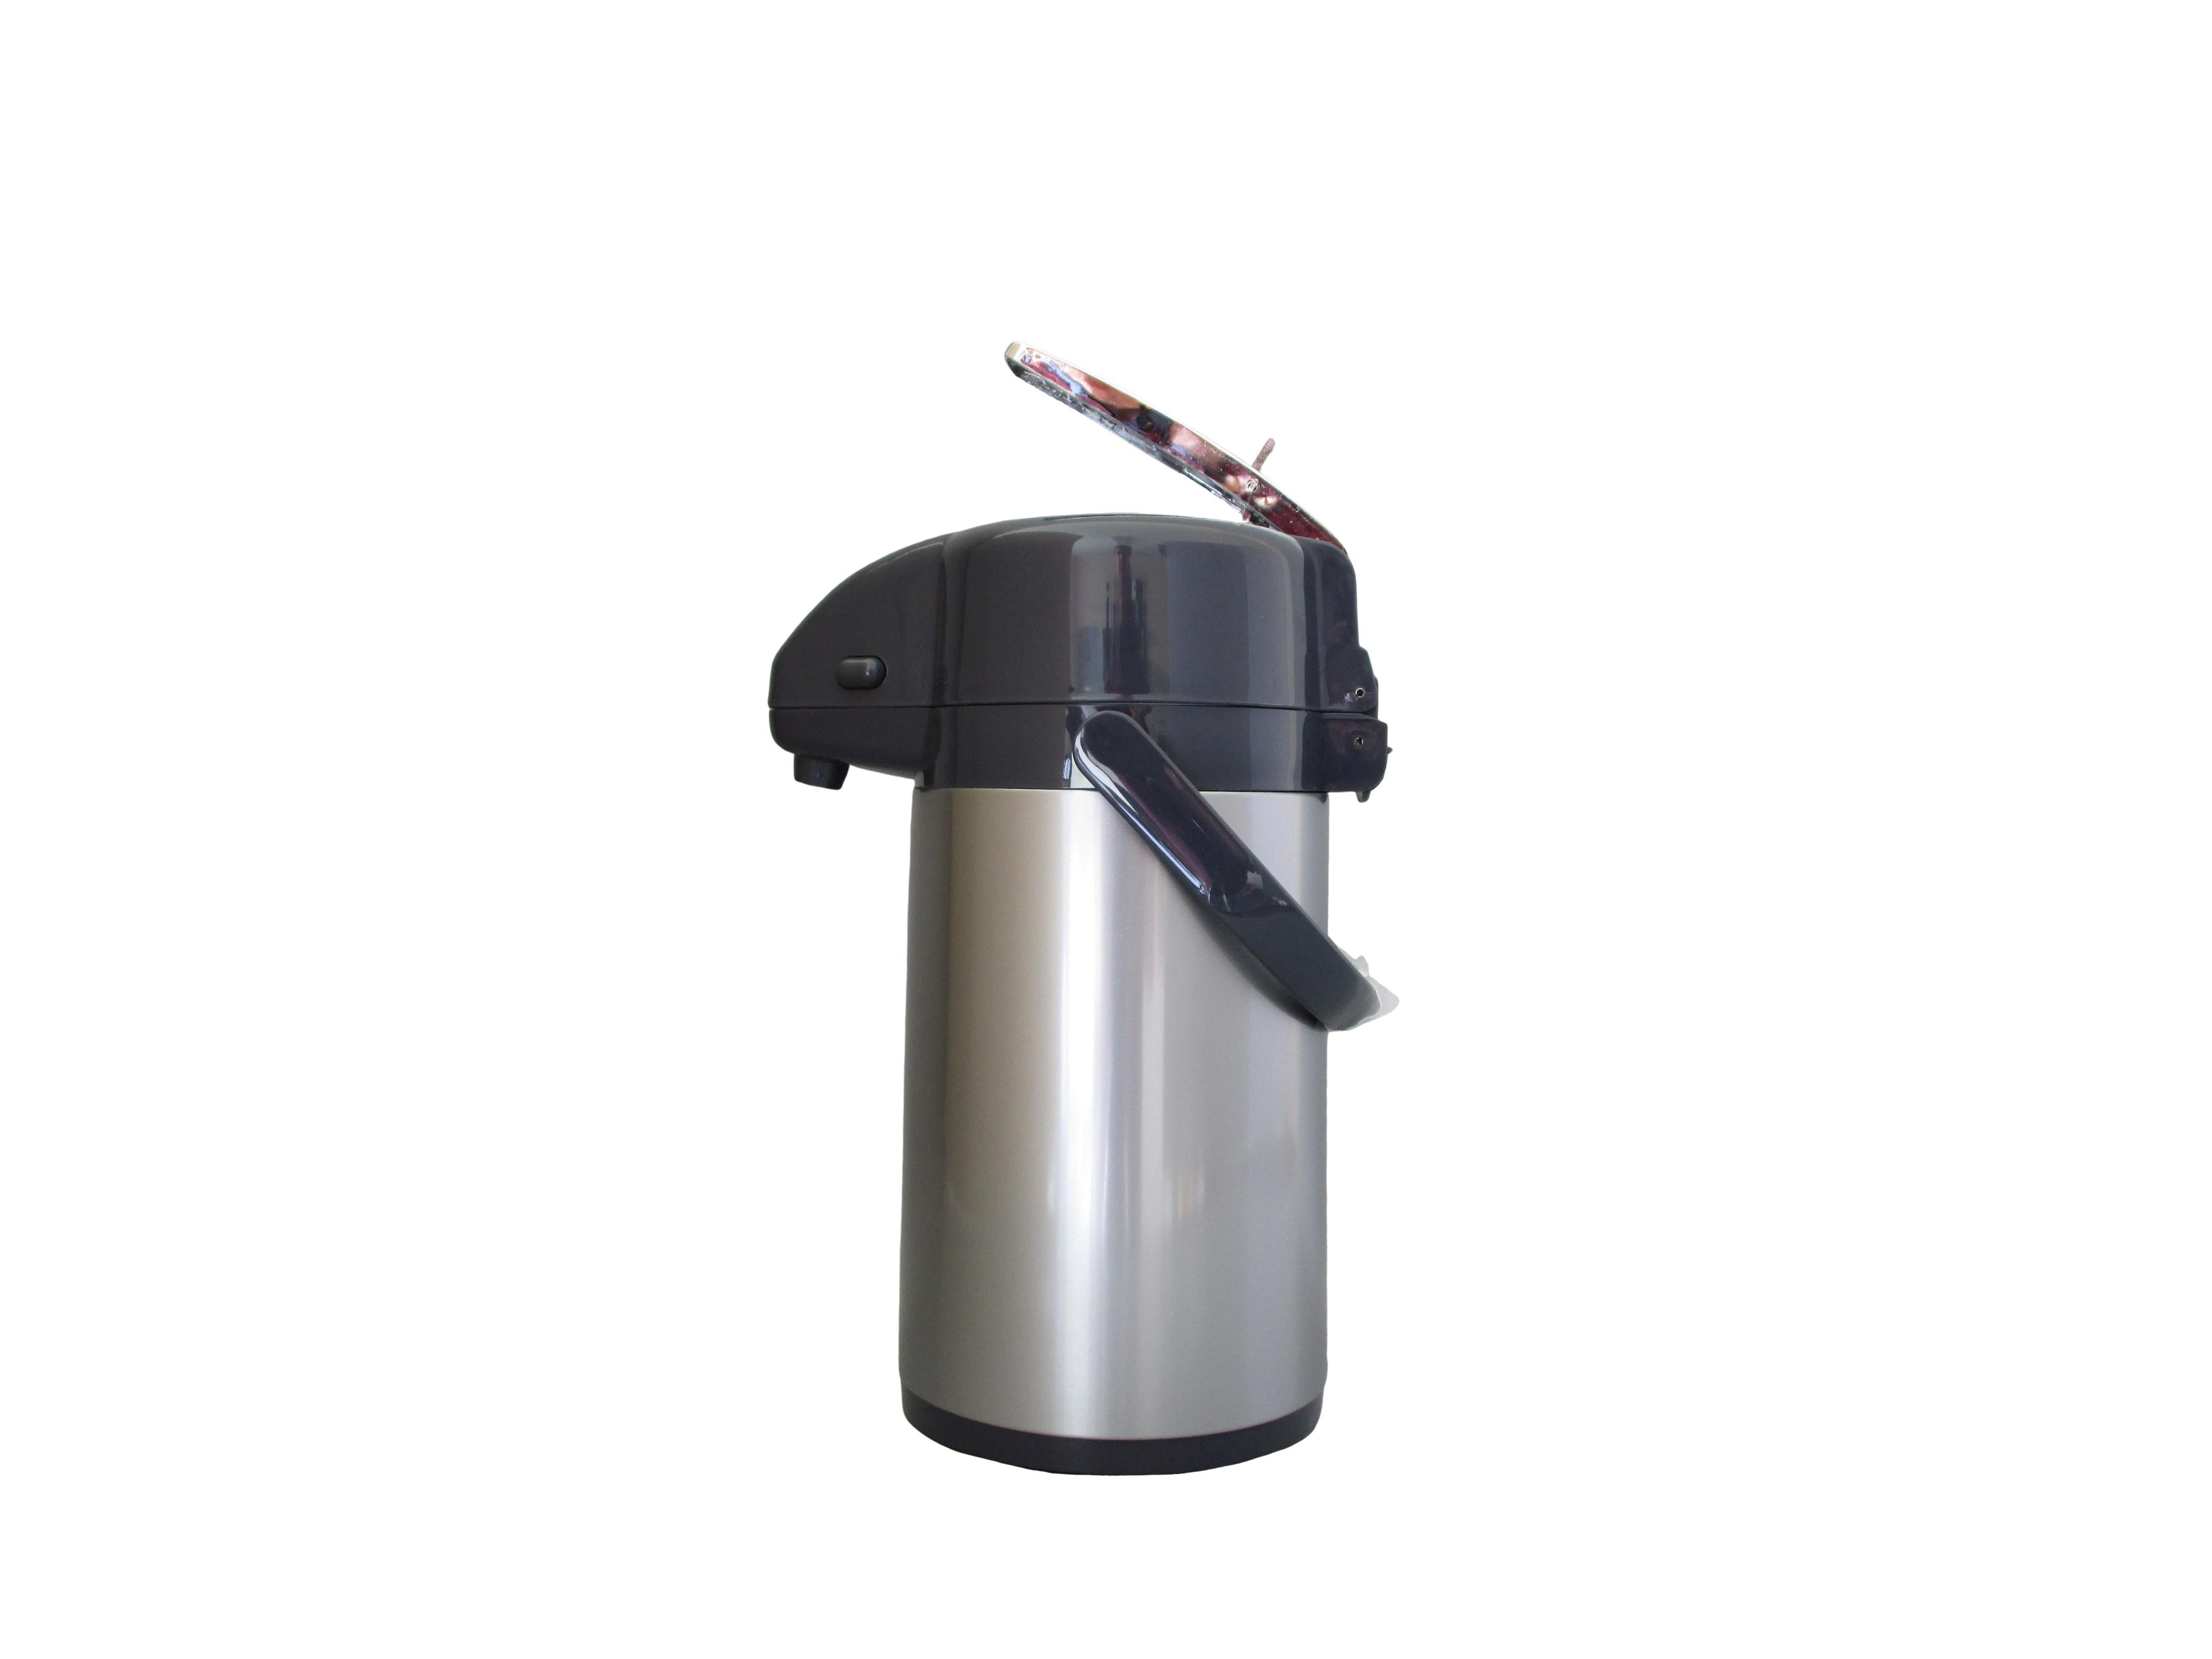 AYM13-049 - Airpot metal with lever dark grey 1.3 L - Isobel